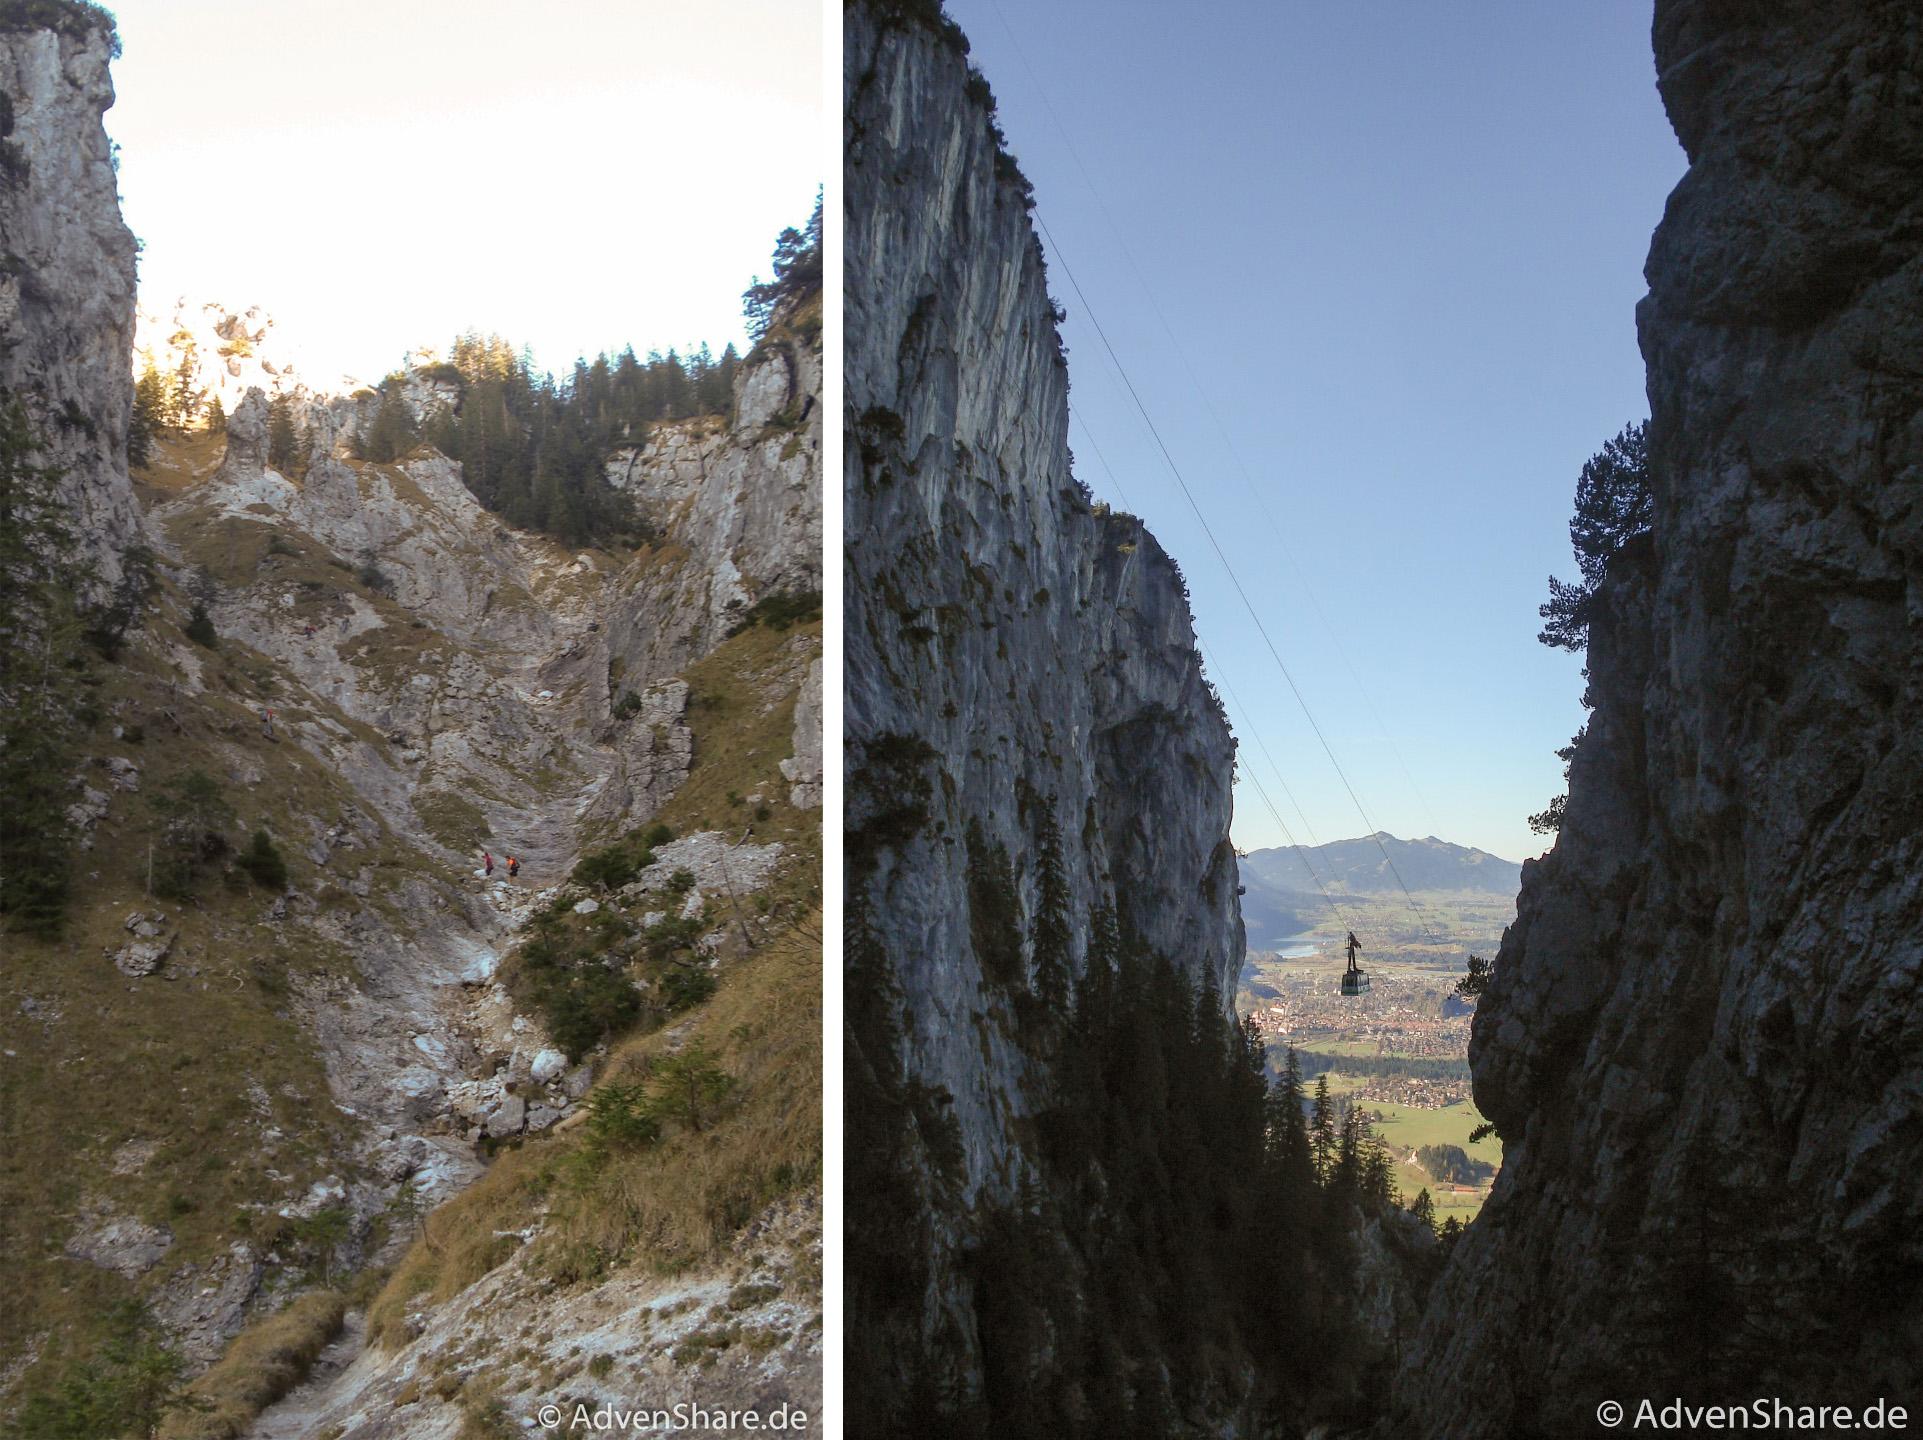 Gelbe Wand Steig-7 (Large)